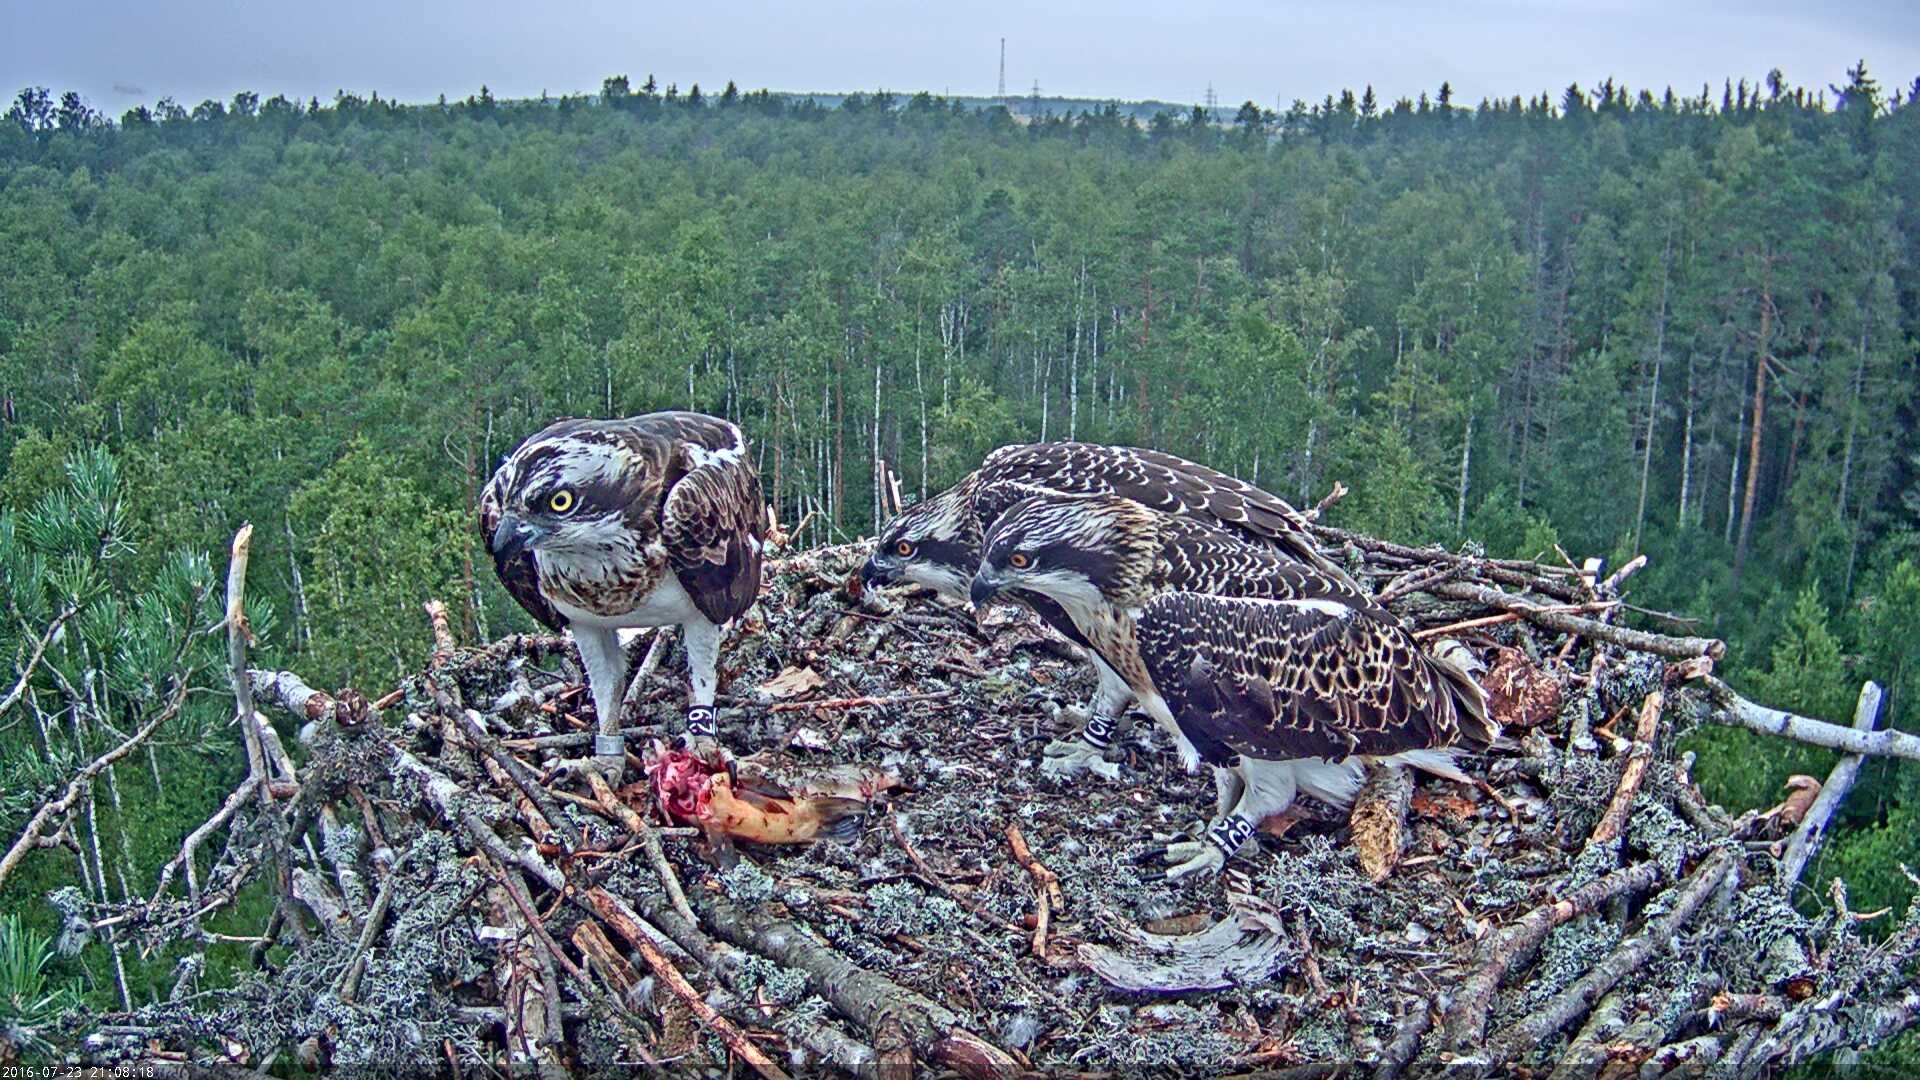 Estonian Osprey Nest Mai & Mati 2016 Kalakotkas-2016-07-23-21-08